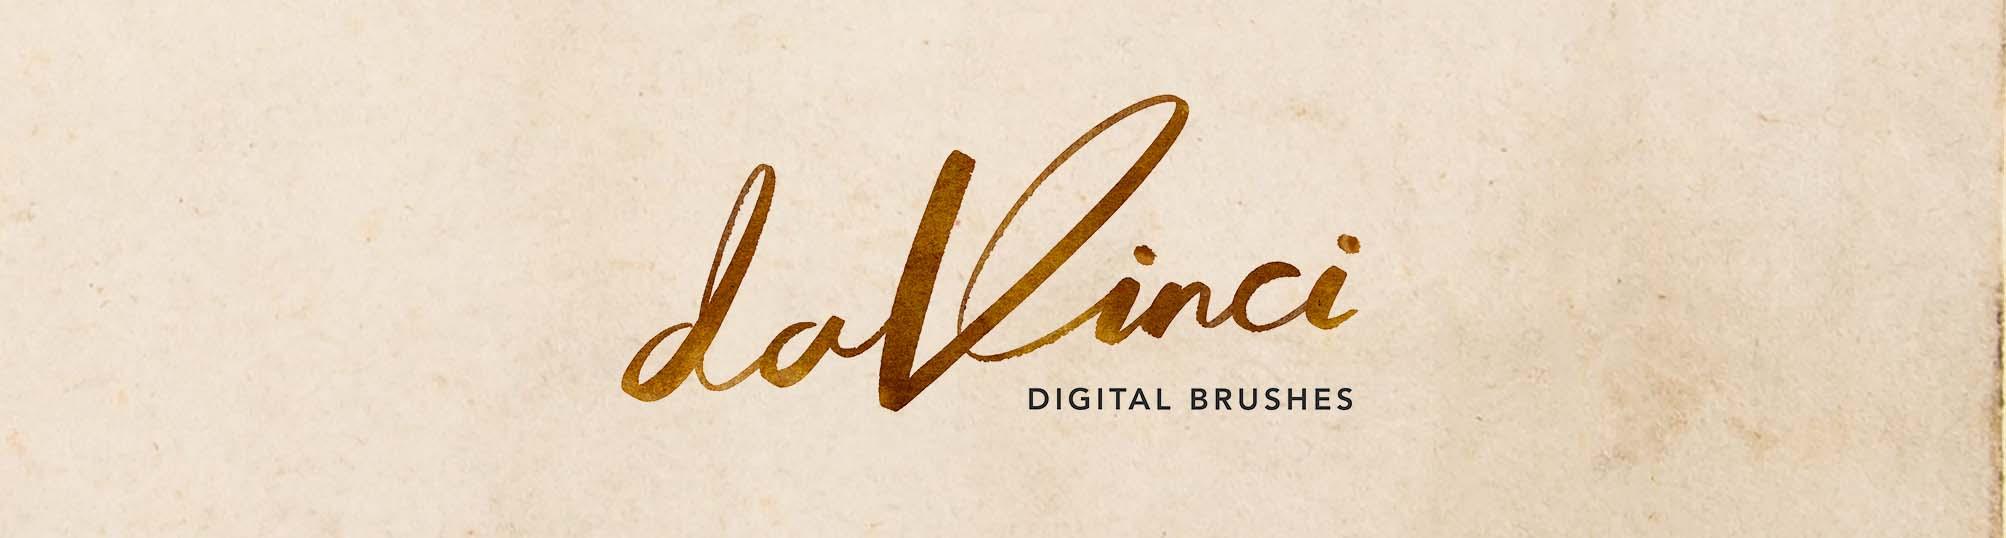 Real-ink DaVinci logo